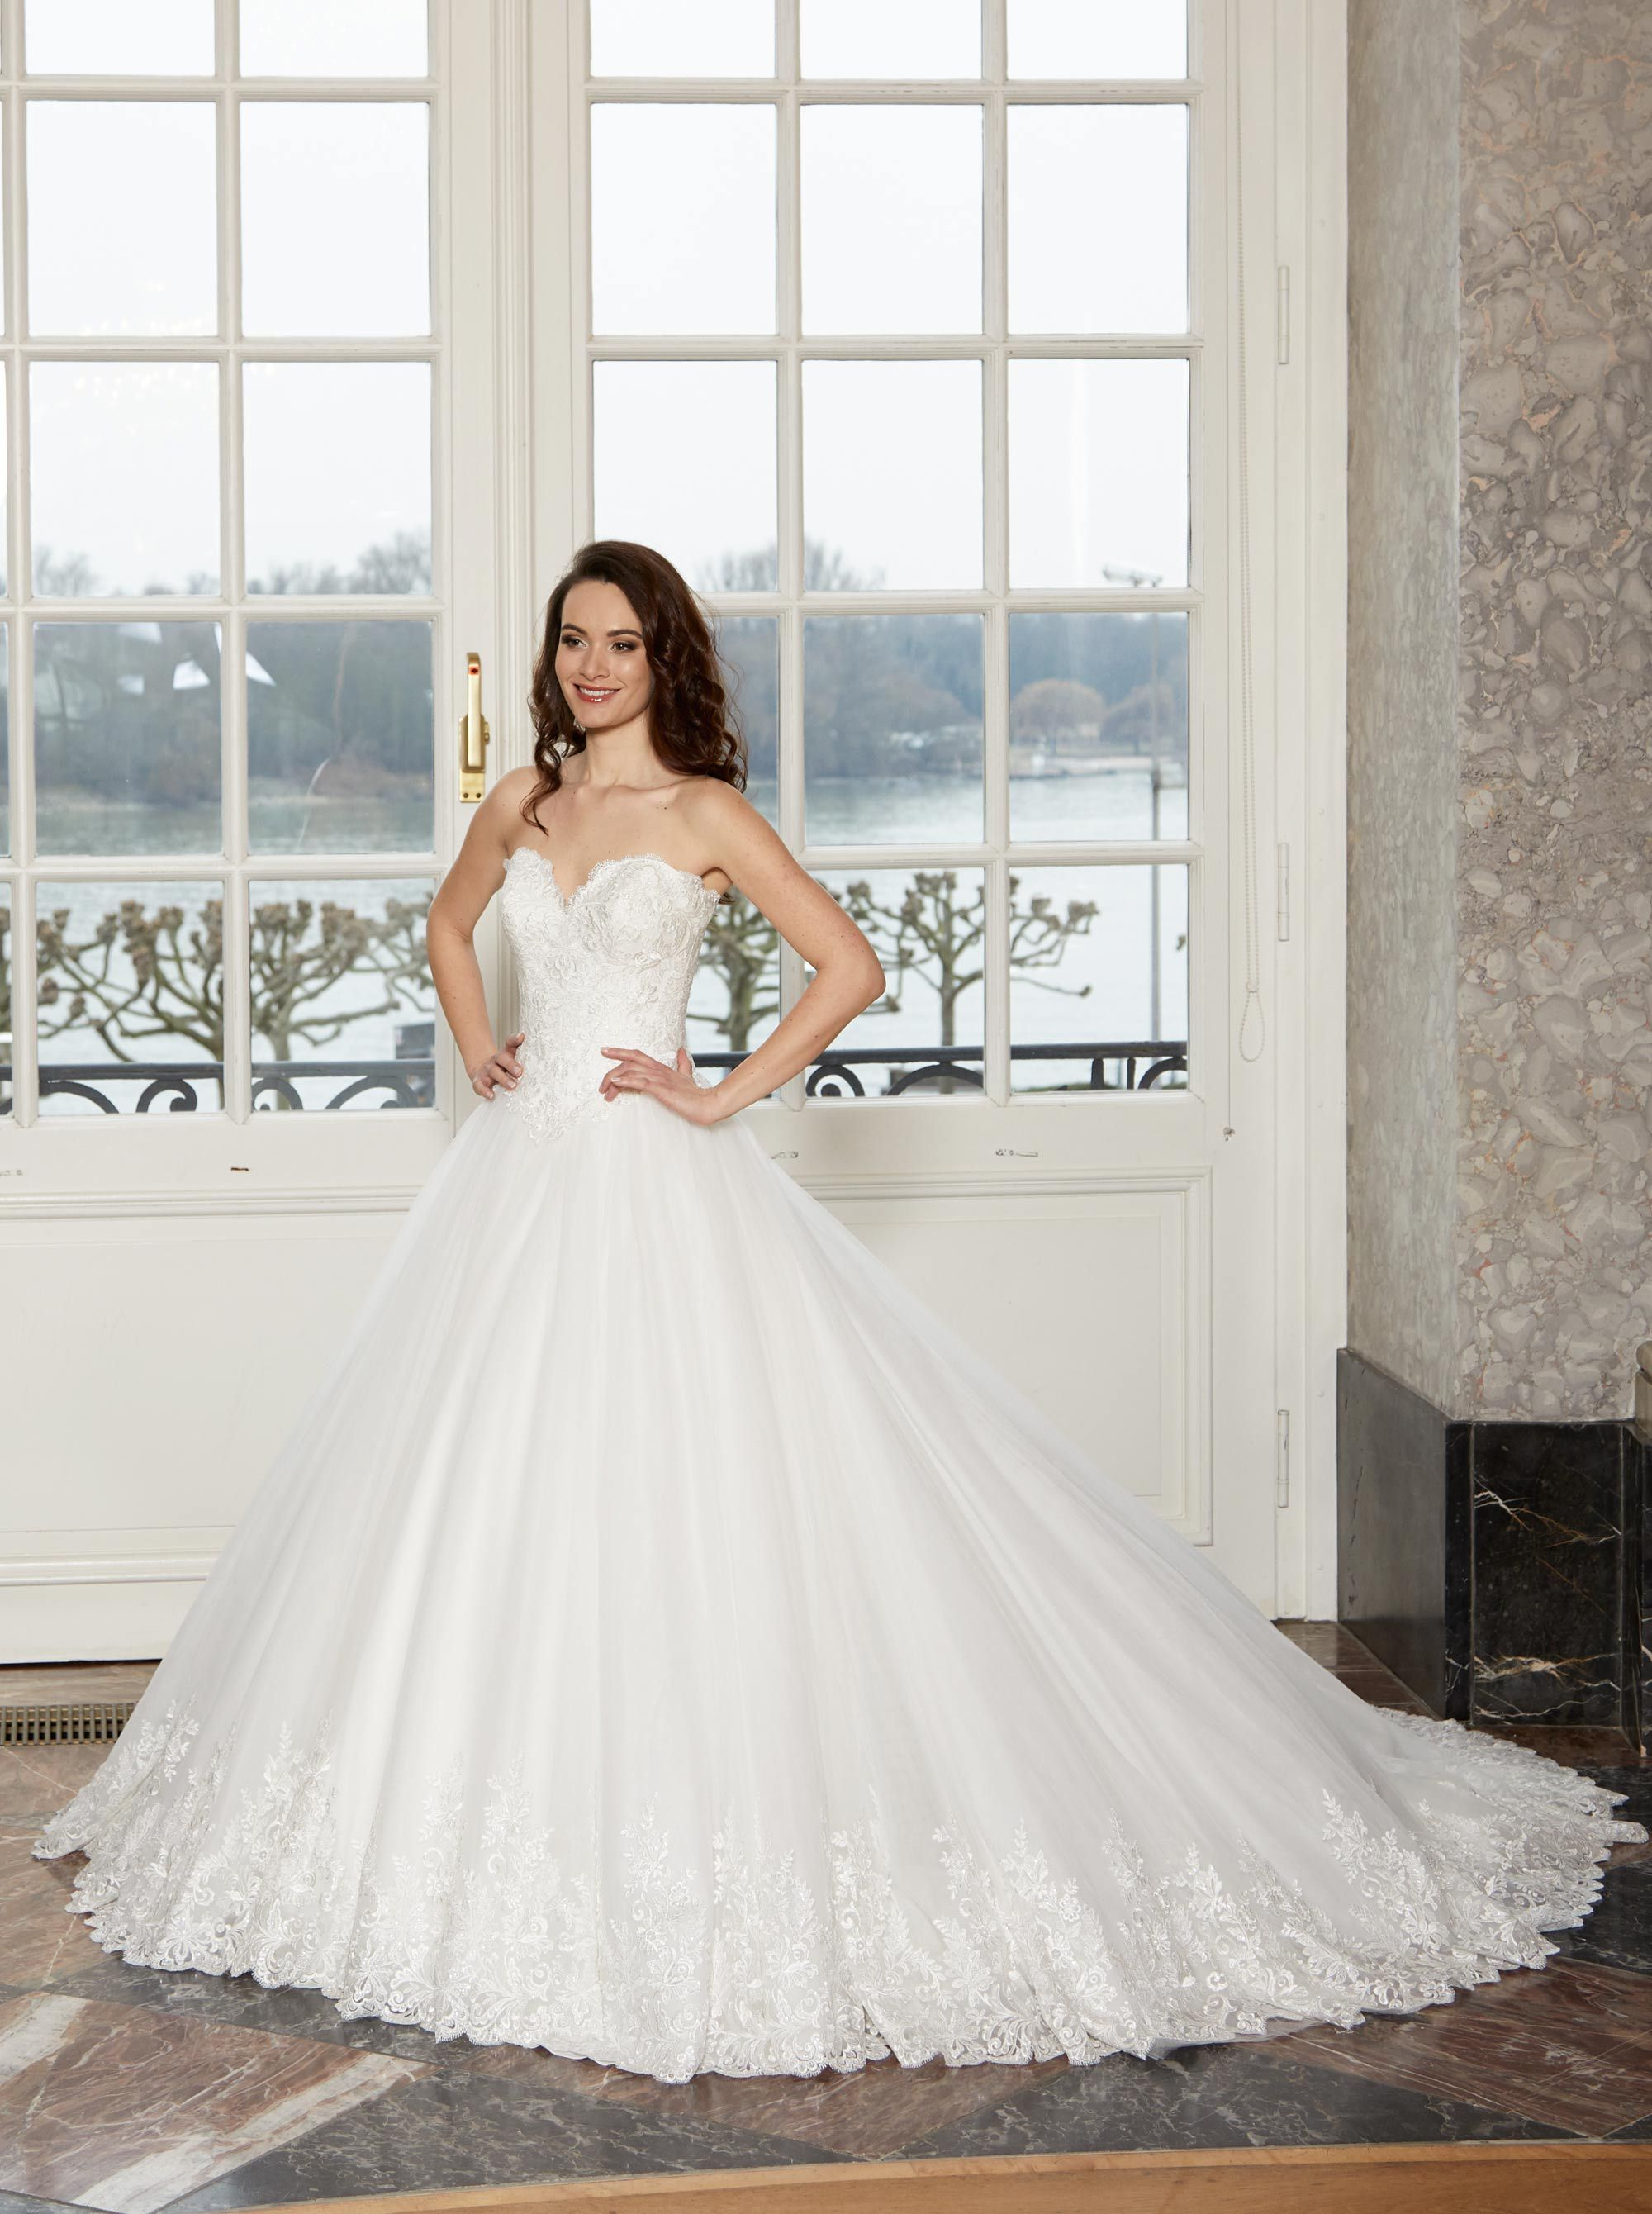 #wedding #bride #dress #weddingdress #bridal #bridalgown #dianelegrand